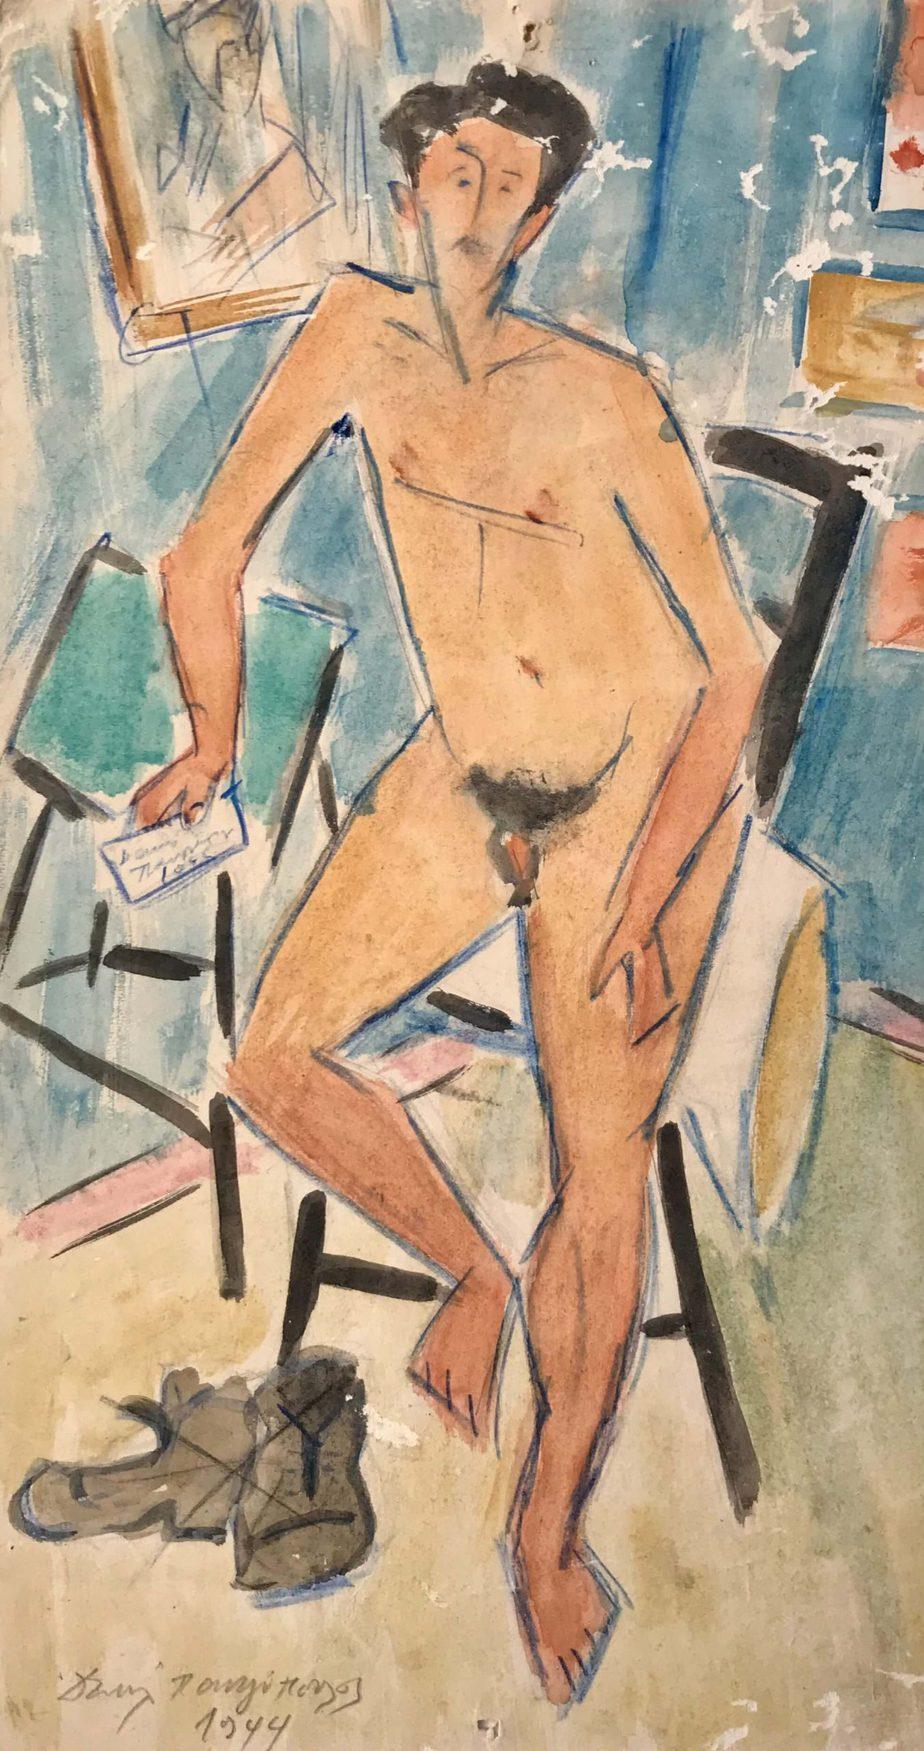 Danil (Panagopoulos) (1924-2008) Watercolor on paper, 1944 32.5 x 18 cm